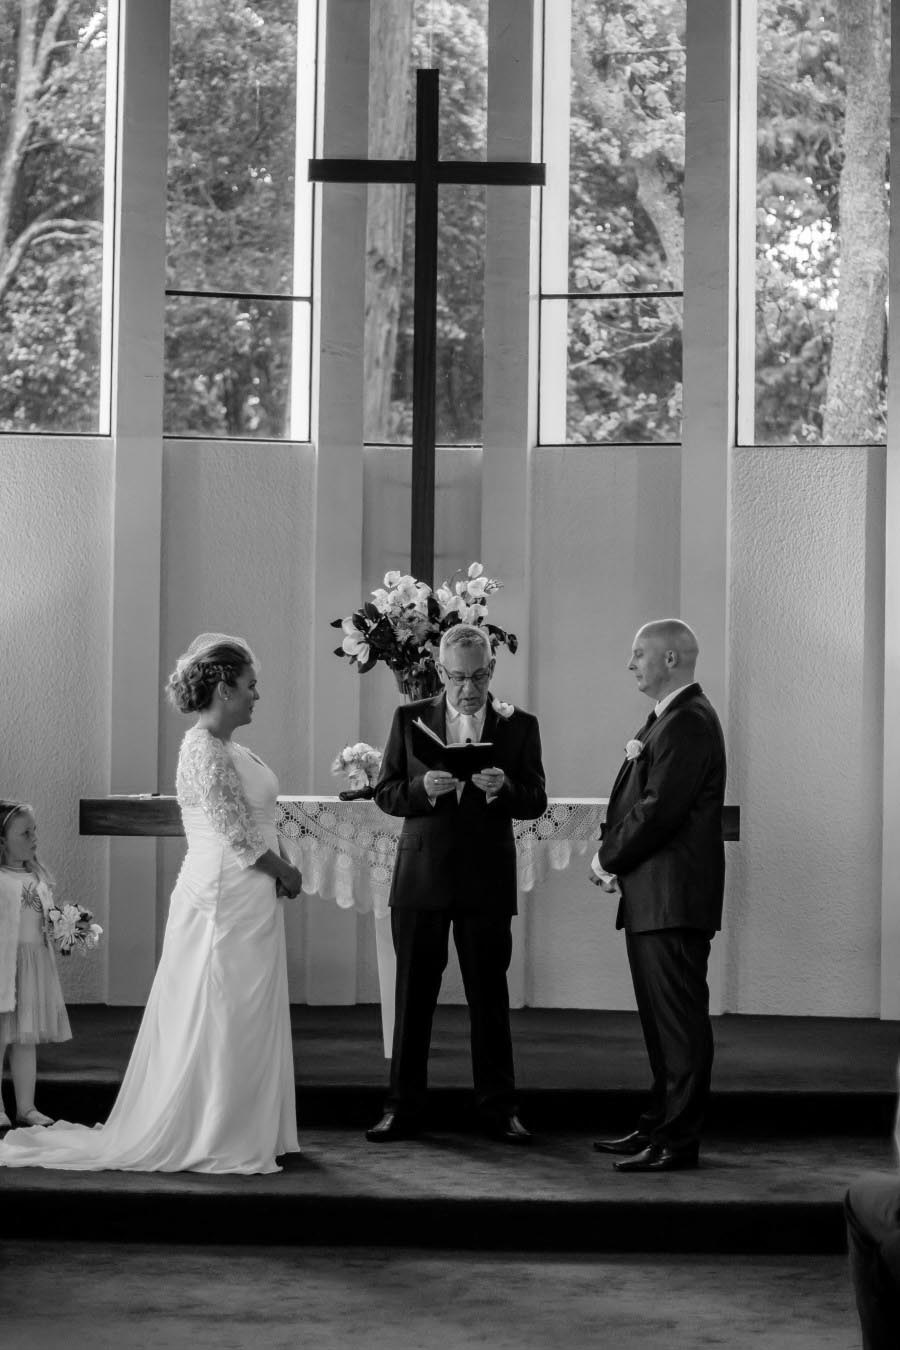 nz_wedding_st_leonards_mchughs-158